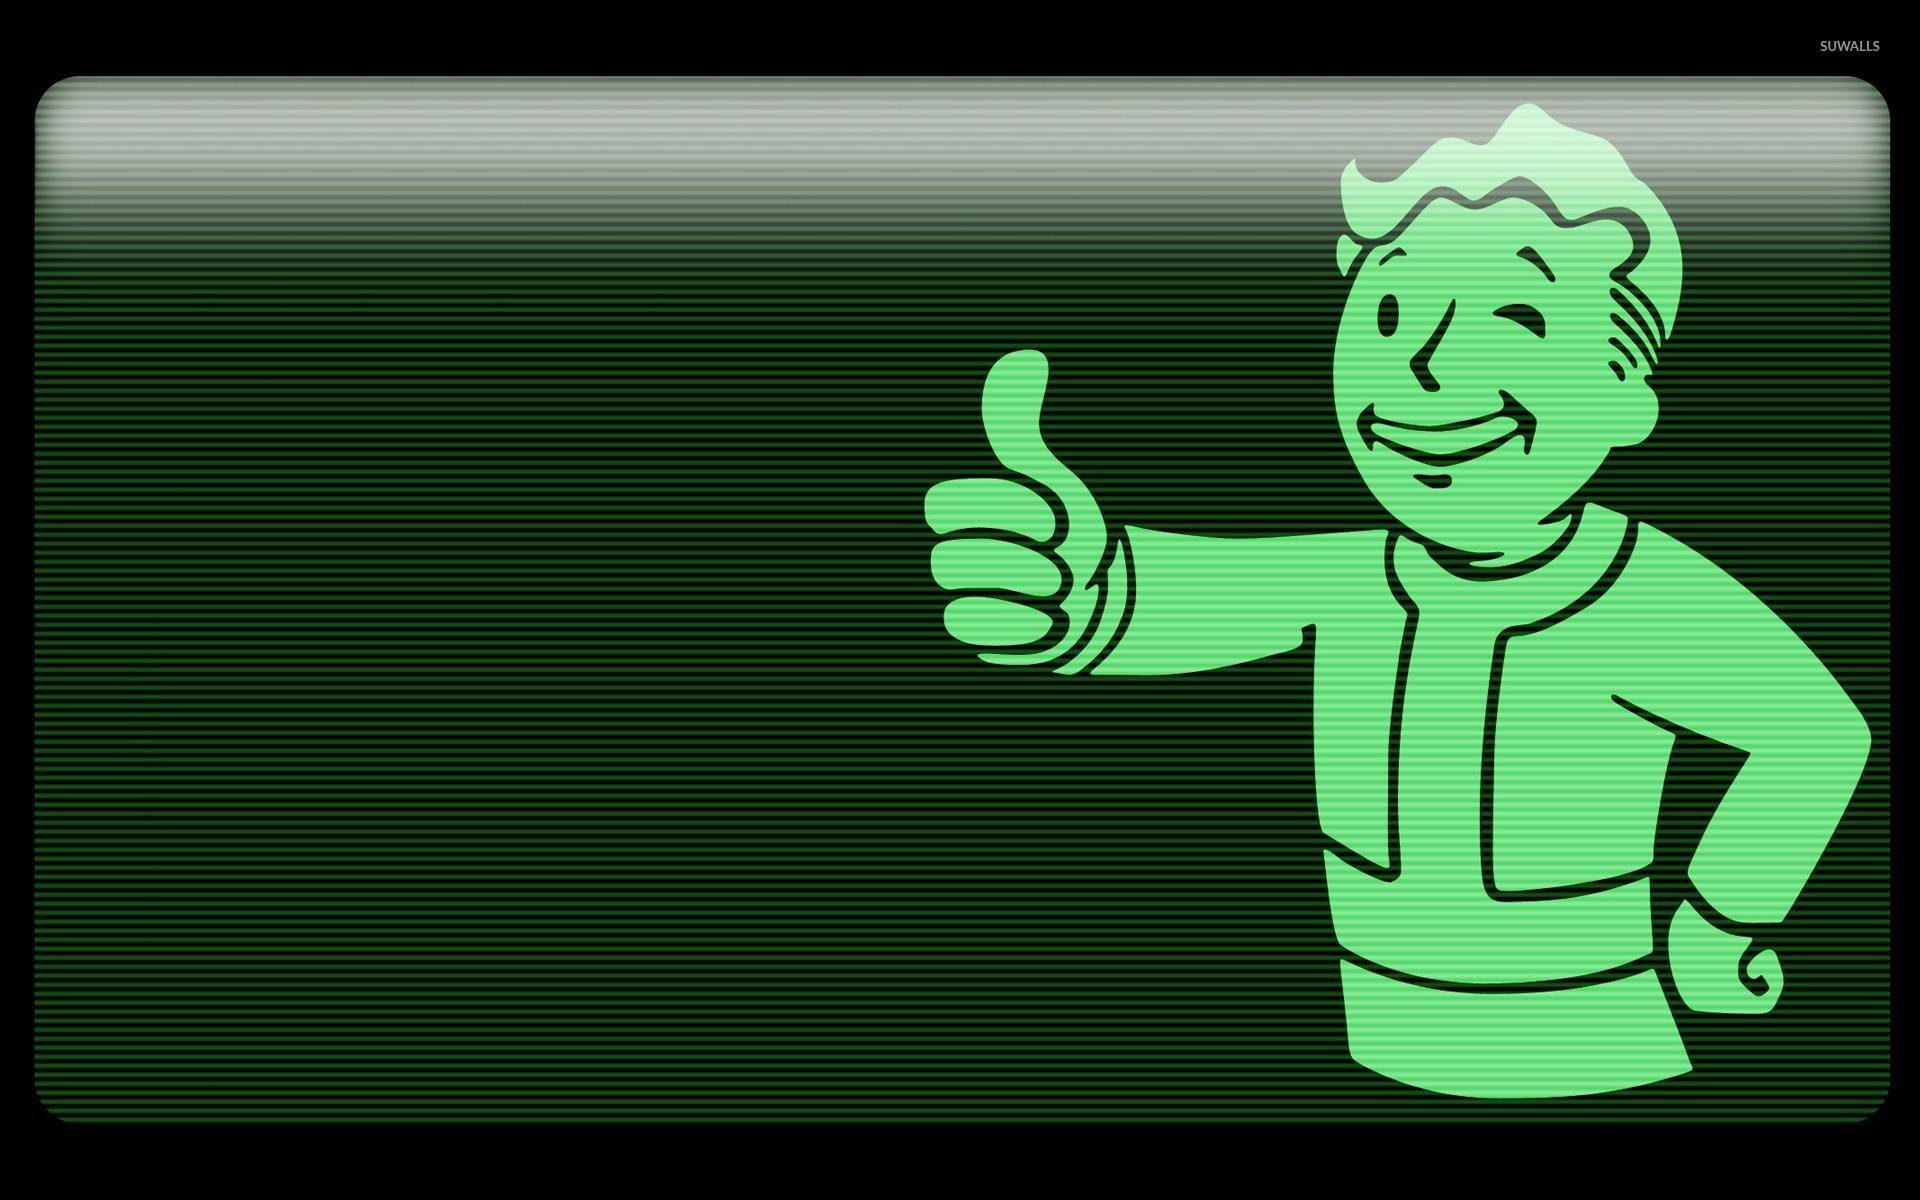 Fallout vault boy clipart hd clipart royalty free download Fallout 2 desktop clipart - ClipartFest clipart royalty free download